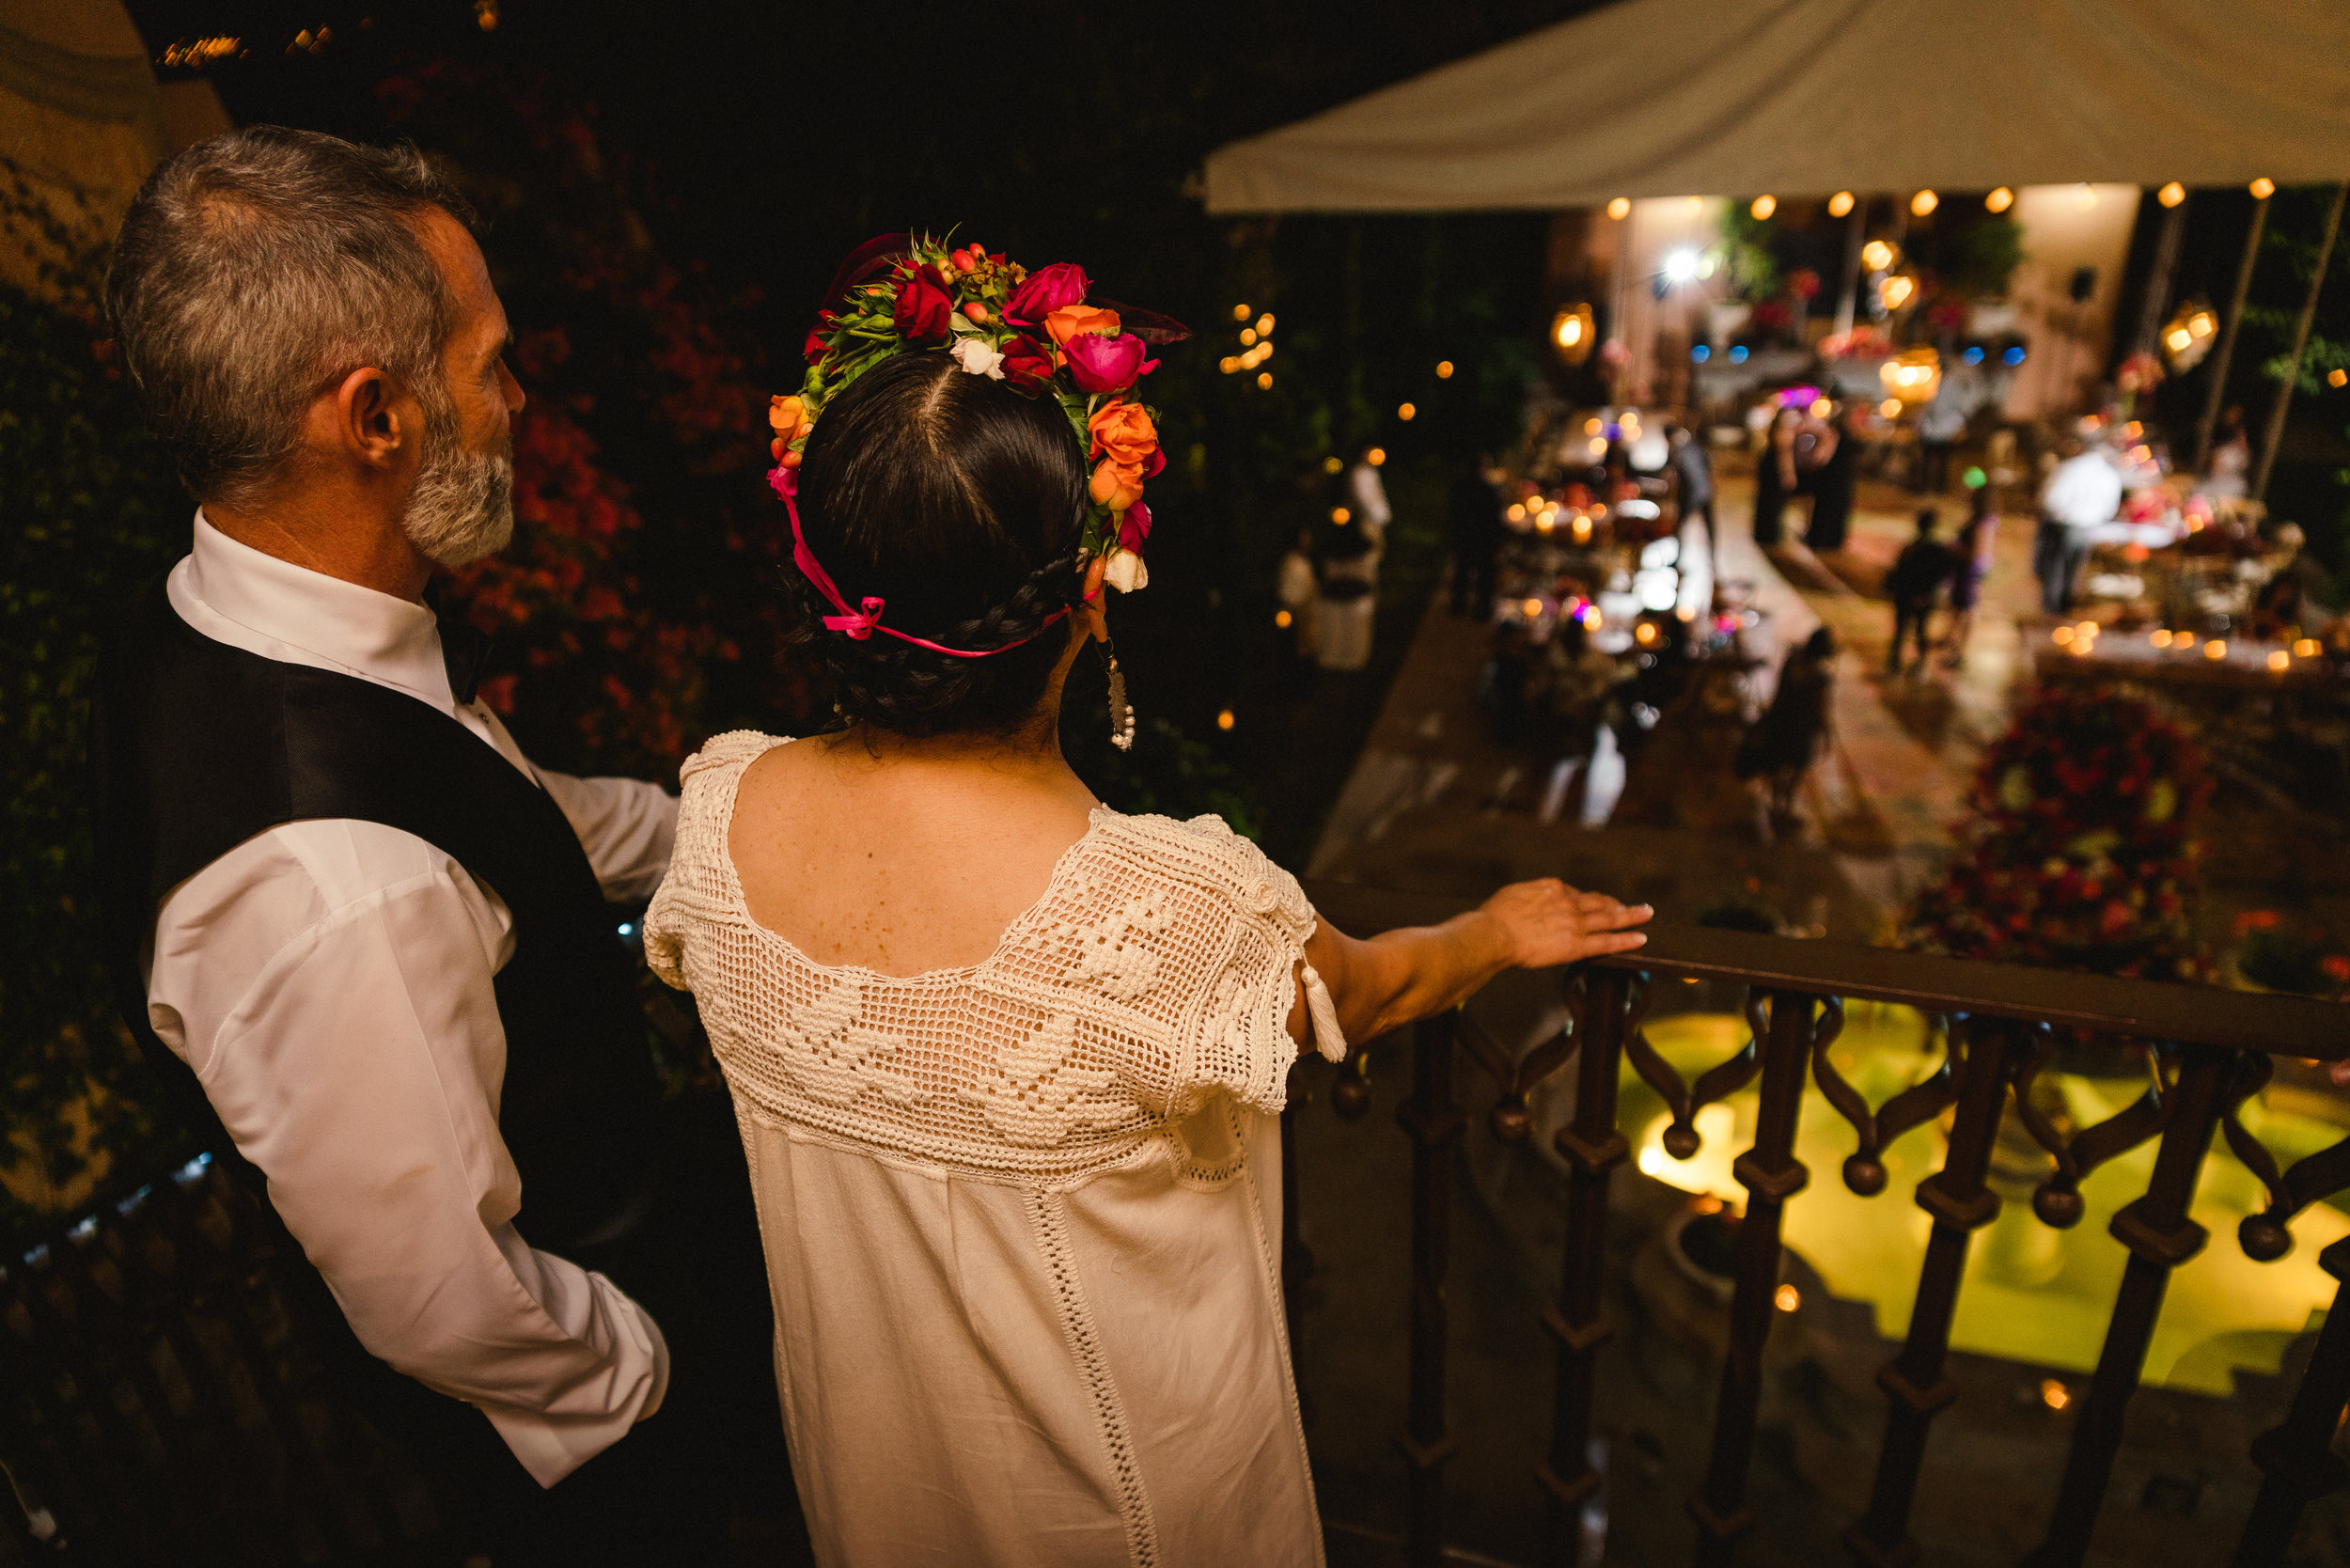 MaurizioSolisBroca-casa-carino-san-miguel-de-allende-wedding-109.jpg